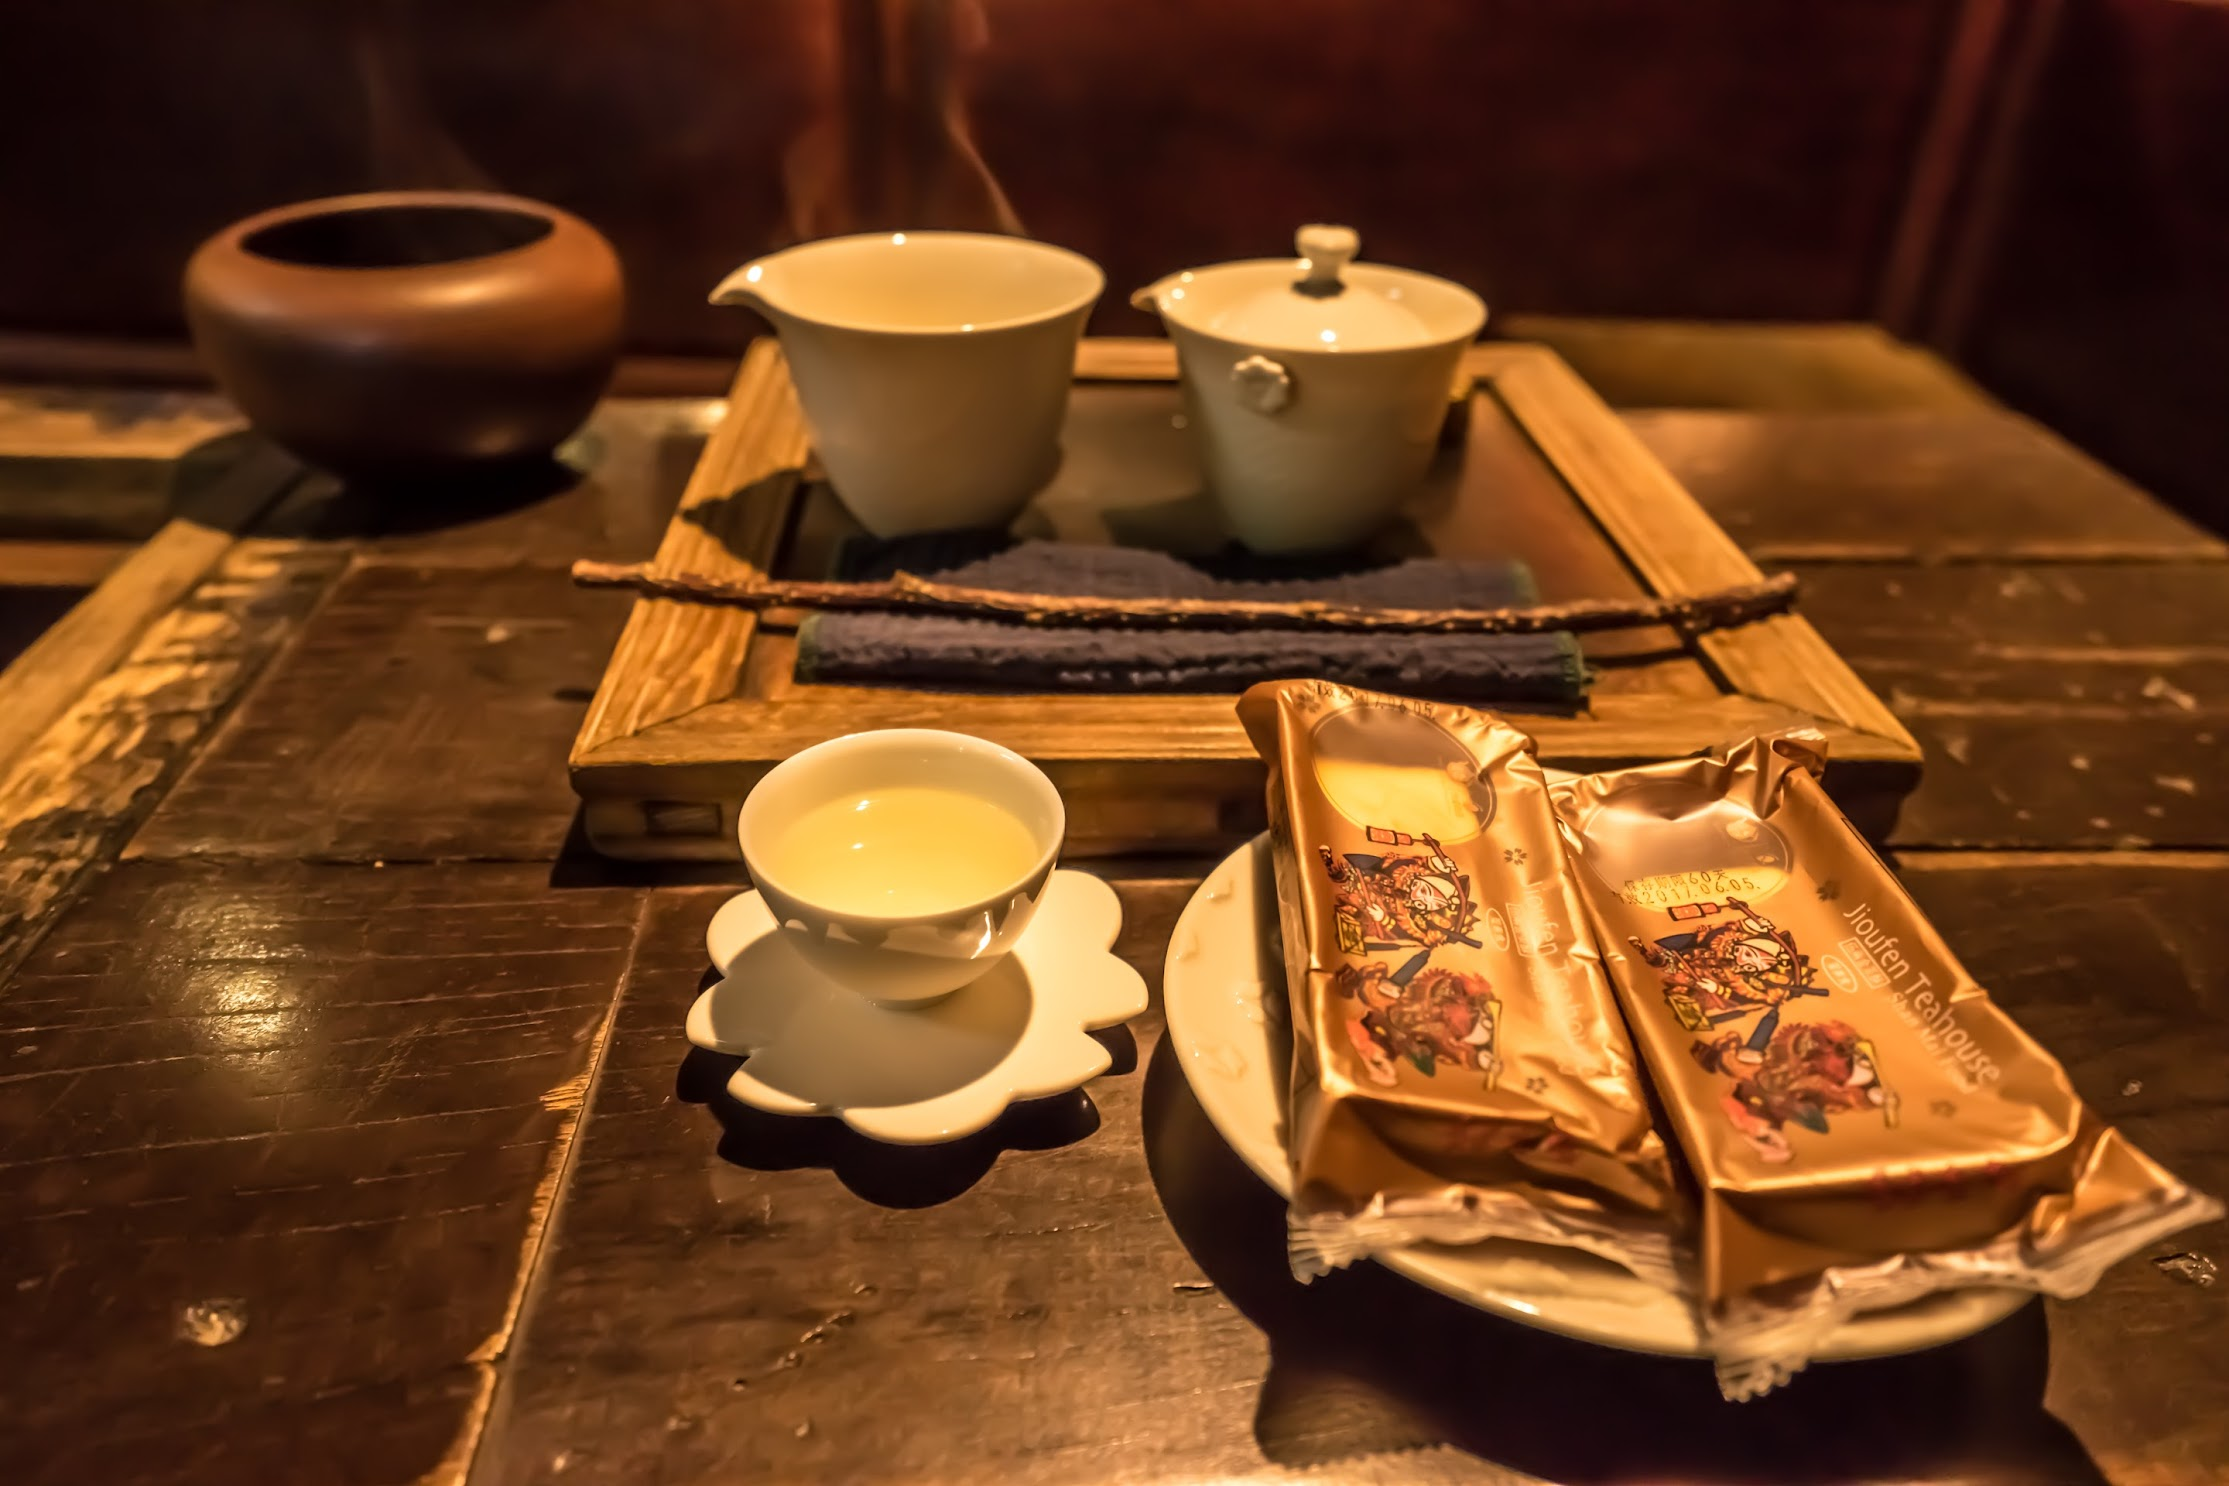 Jiufen Jioufen Teahouse Pineapple cake